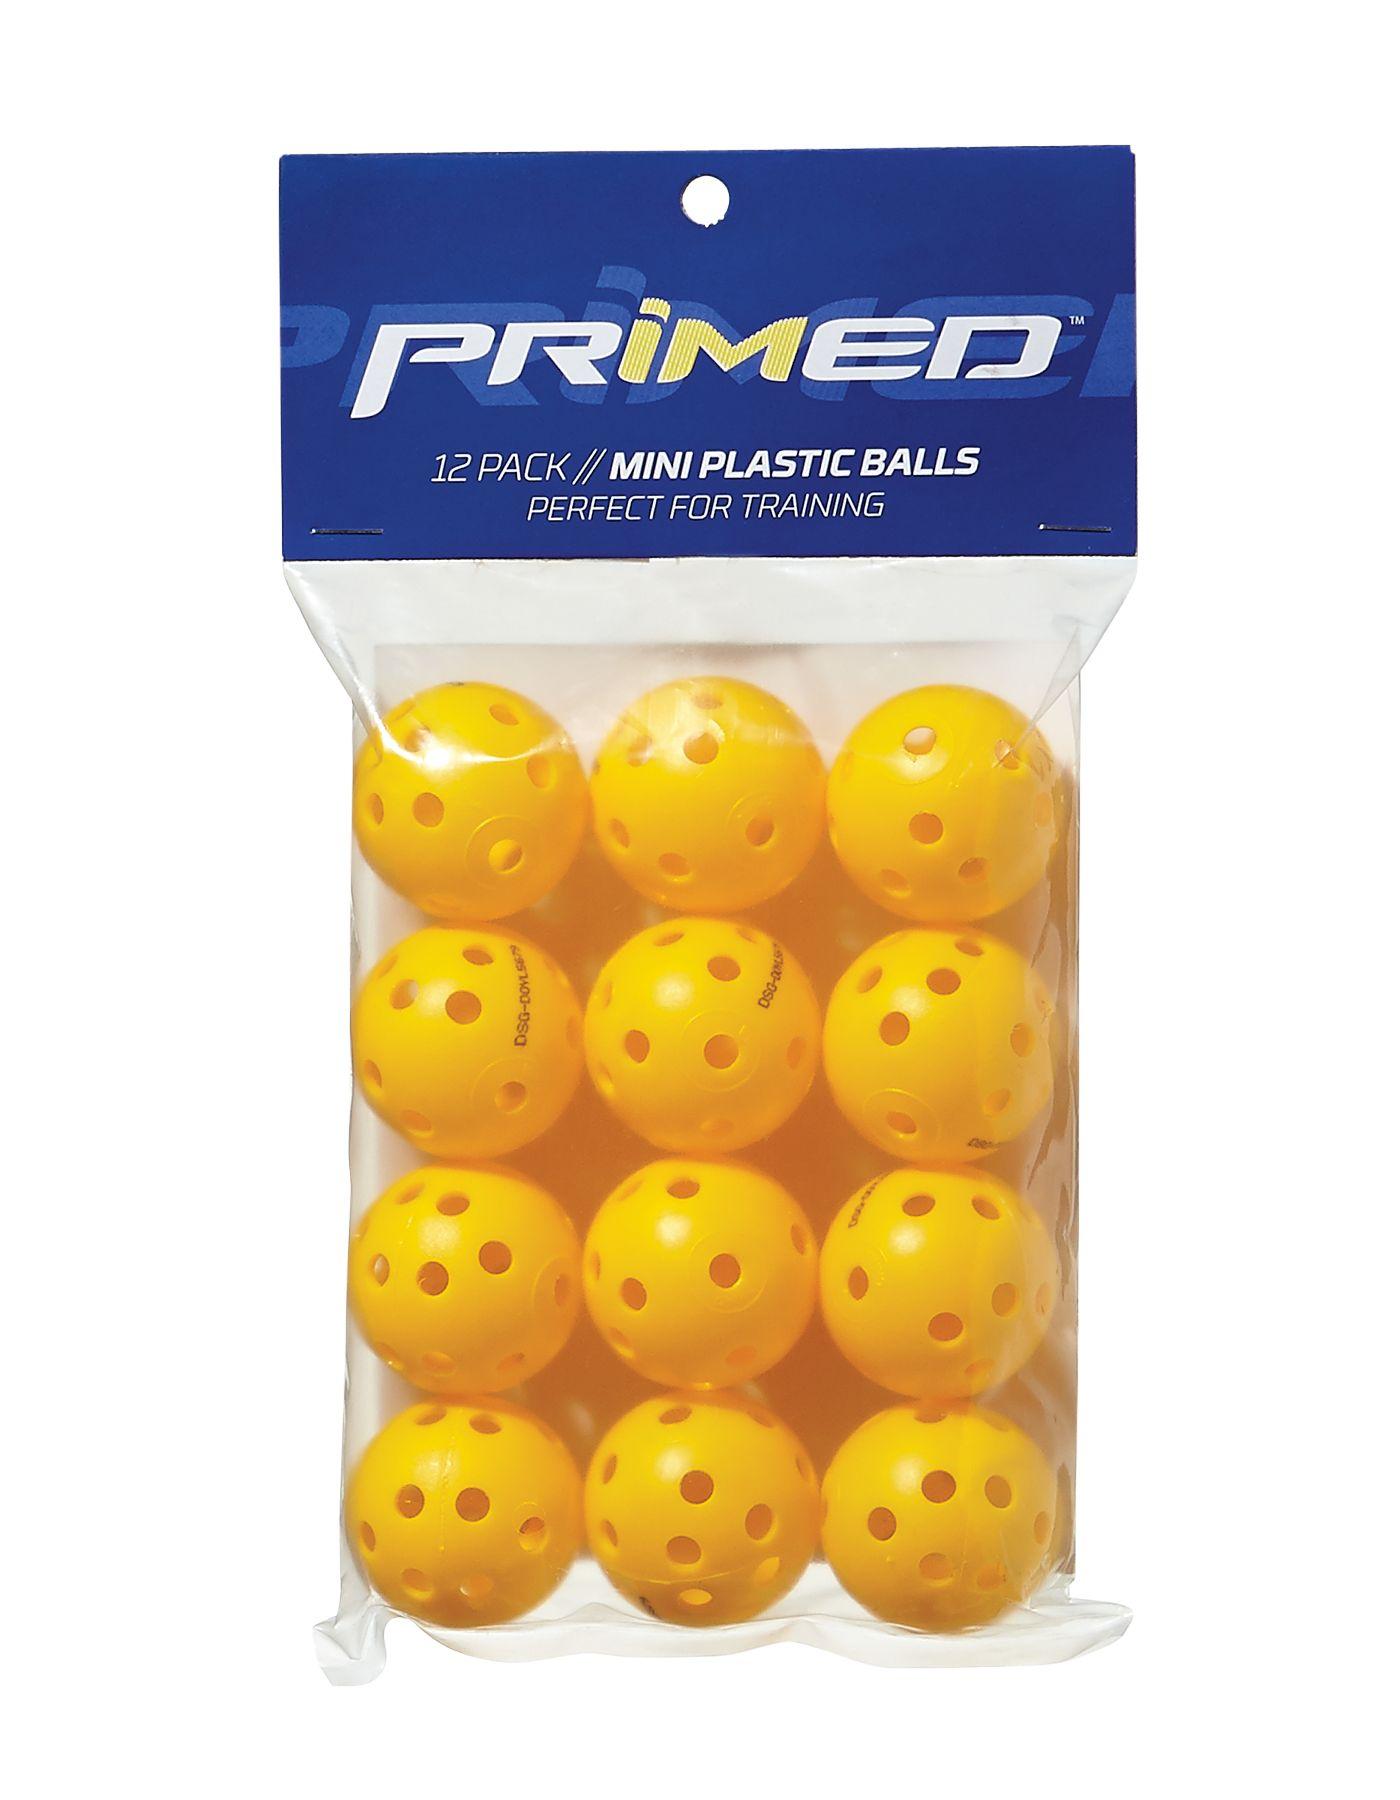 PRIMED Mini Plastic Training Balls - 12 Pack